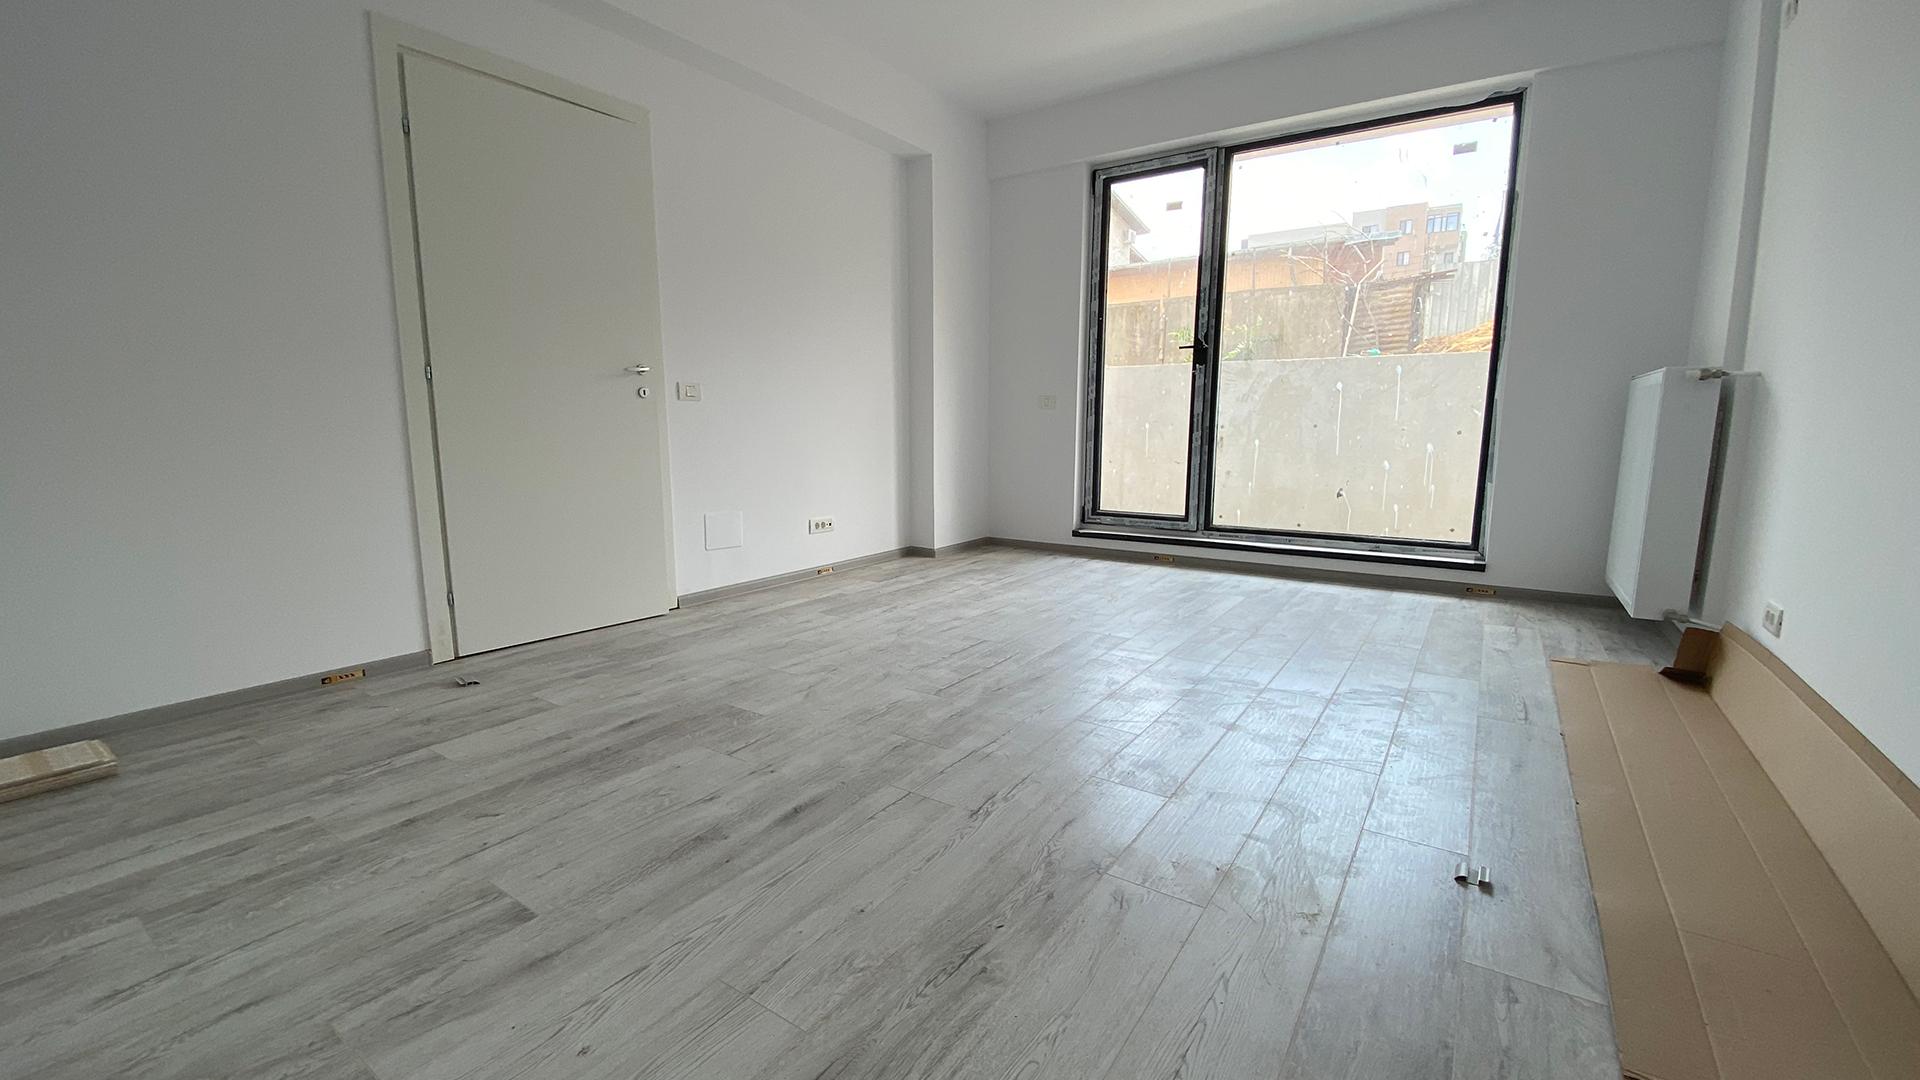 Stadiu executie Uverturii Residence 10 Iulie 2020 - Apartamente si garsoniere de vanzare Militari, Gorjului - 4